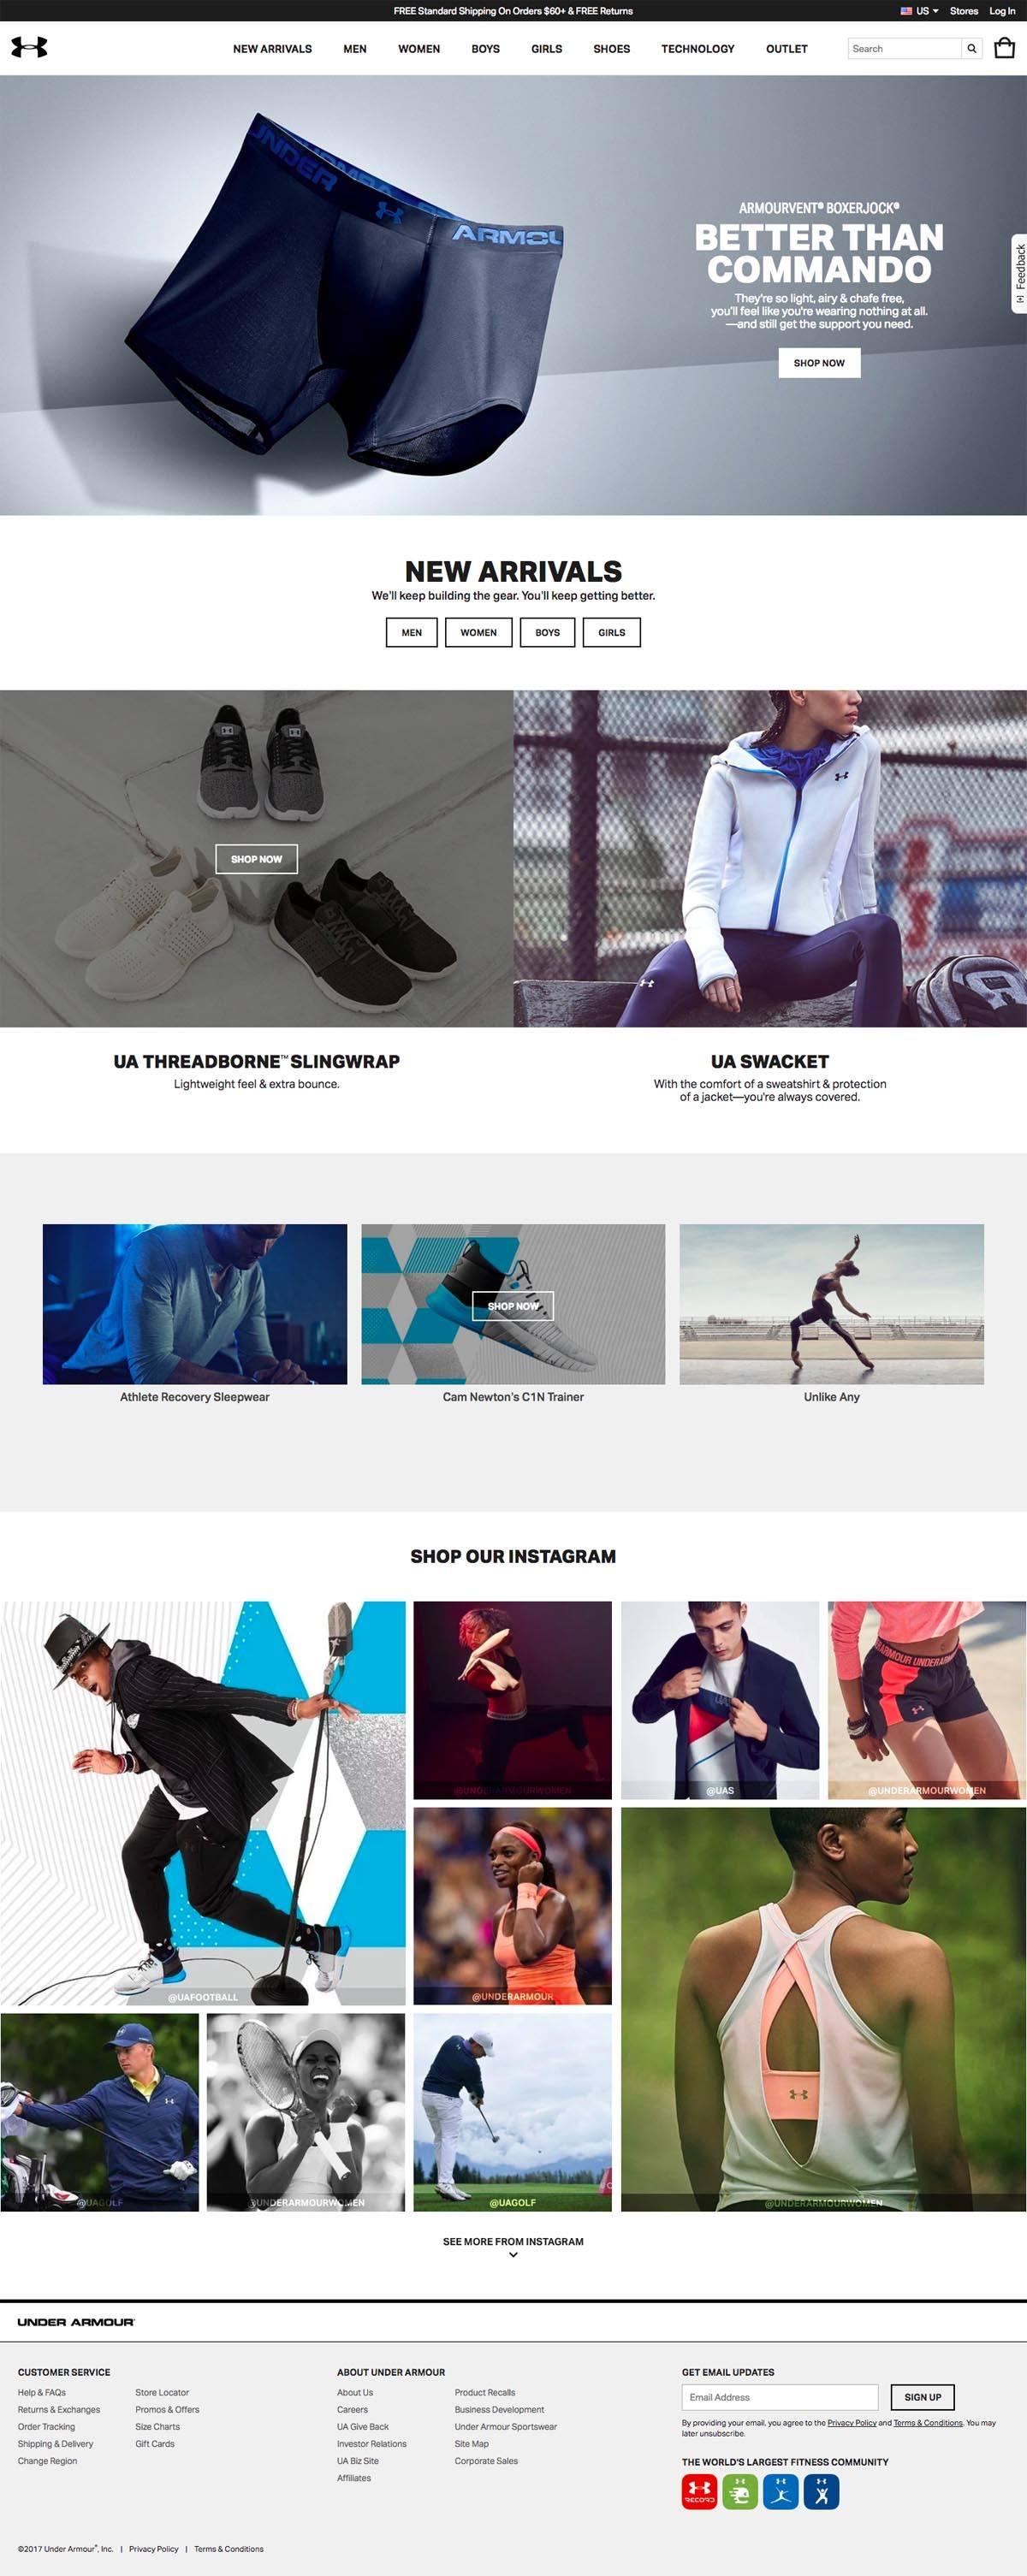 eCommerce website: Under Armour